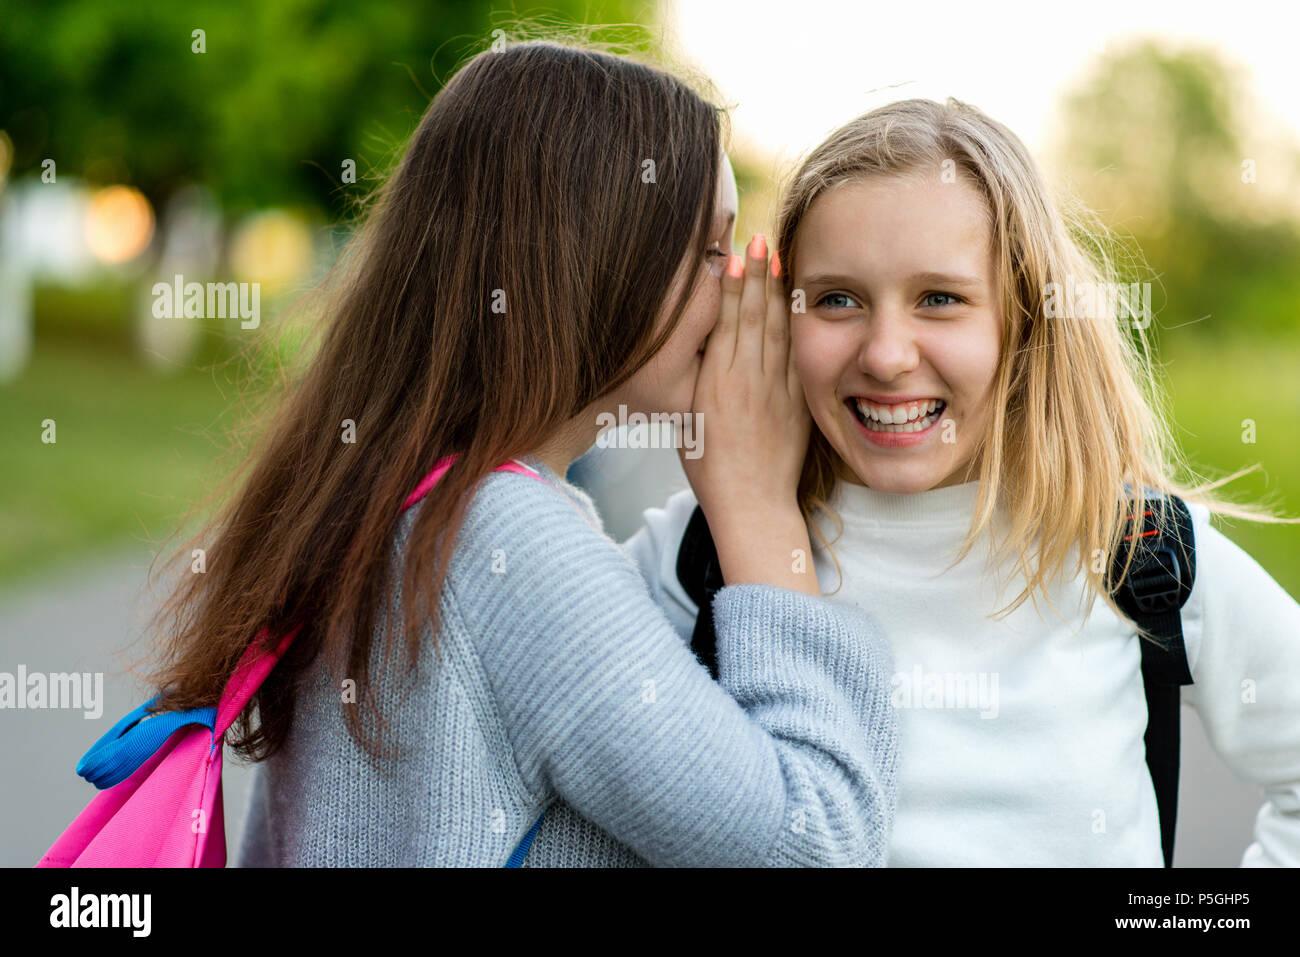 In summer city park. Two girl friends schoolgirls teenagers. Concept of joke, secret, fantasy, conversation, whisper, surprise. Emotion of happiness is pleasure, joy, smile, pleasure.After school. - Stock Image